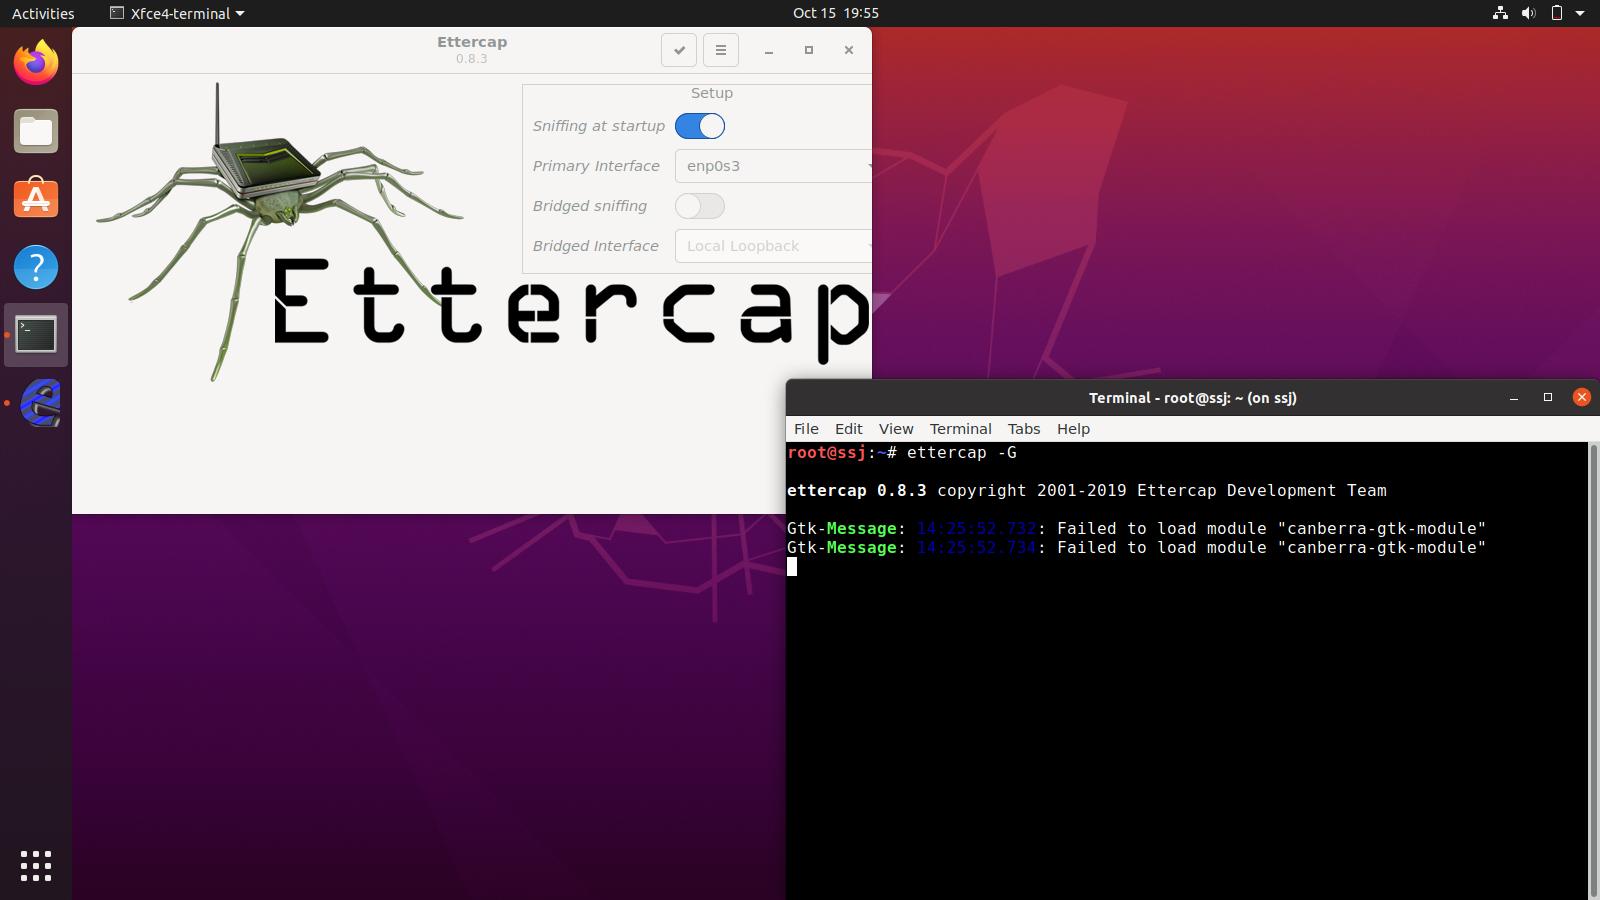 ssj ss ettercap - SSJ: The Linux distribution that surpassed the power of Super Saiyan